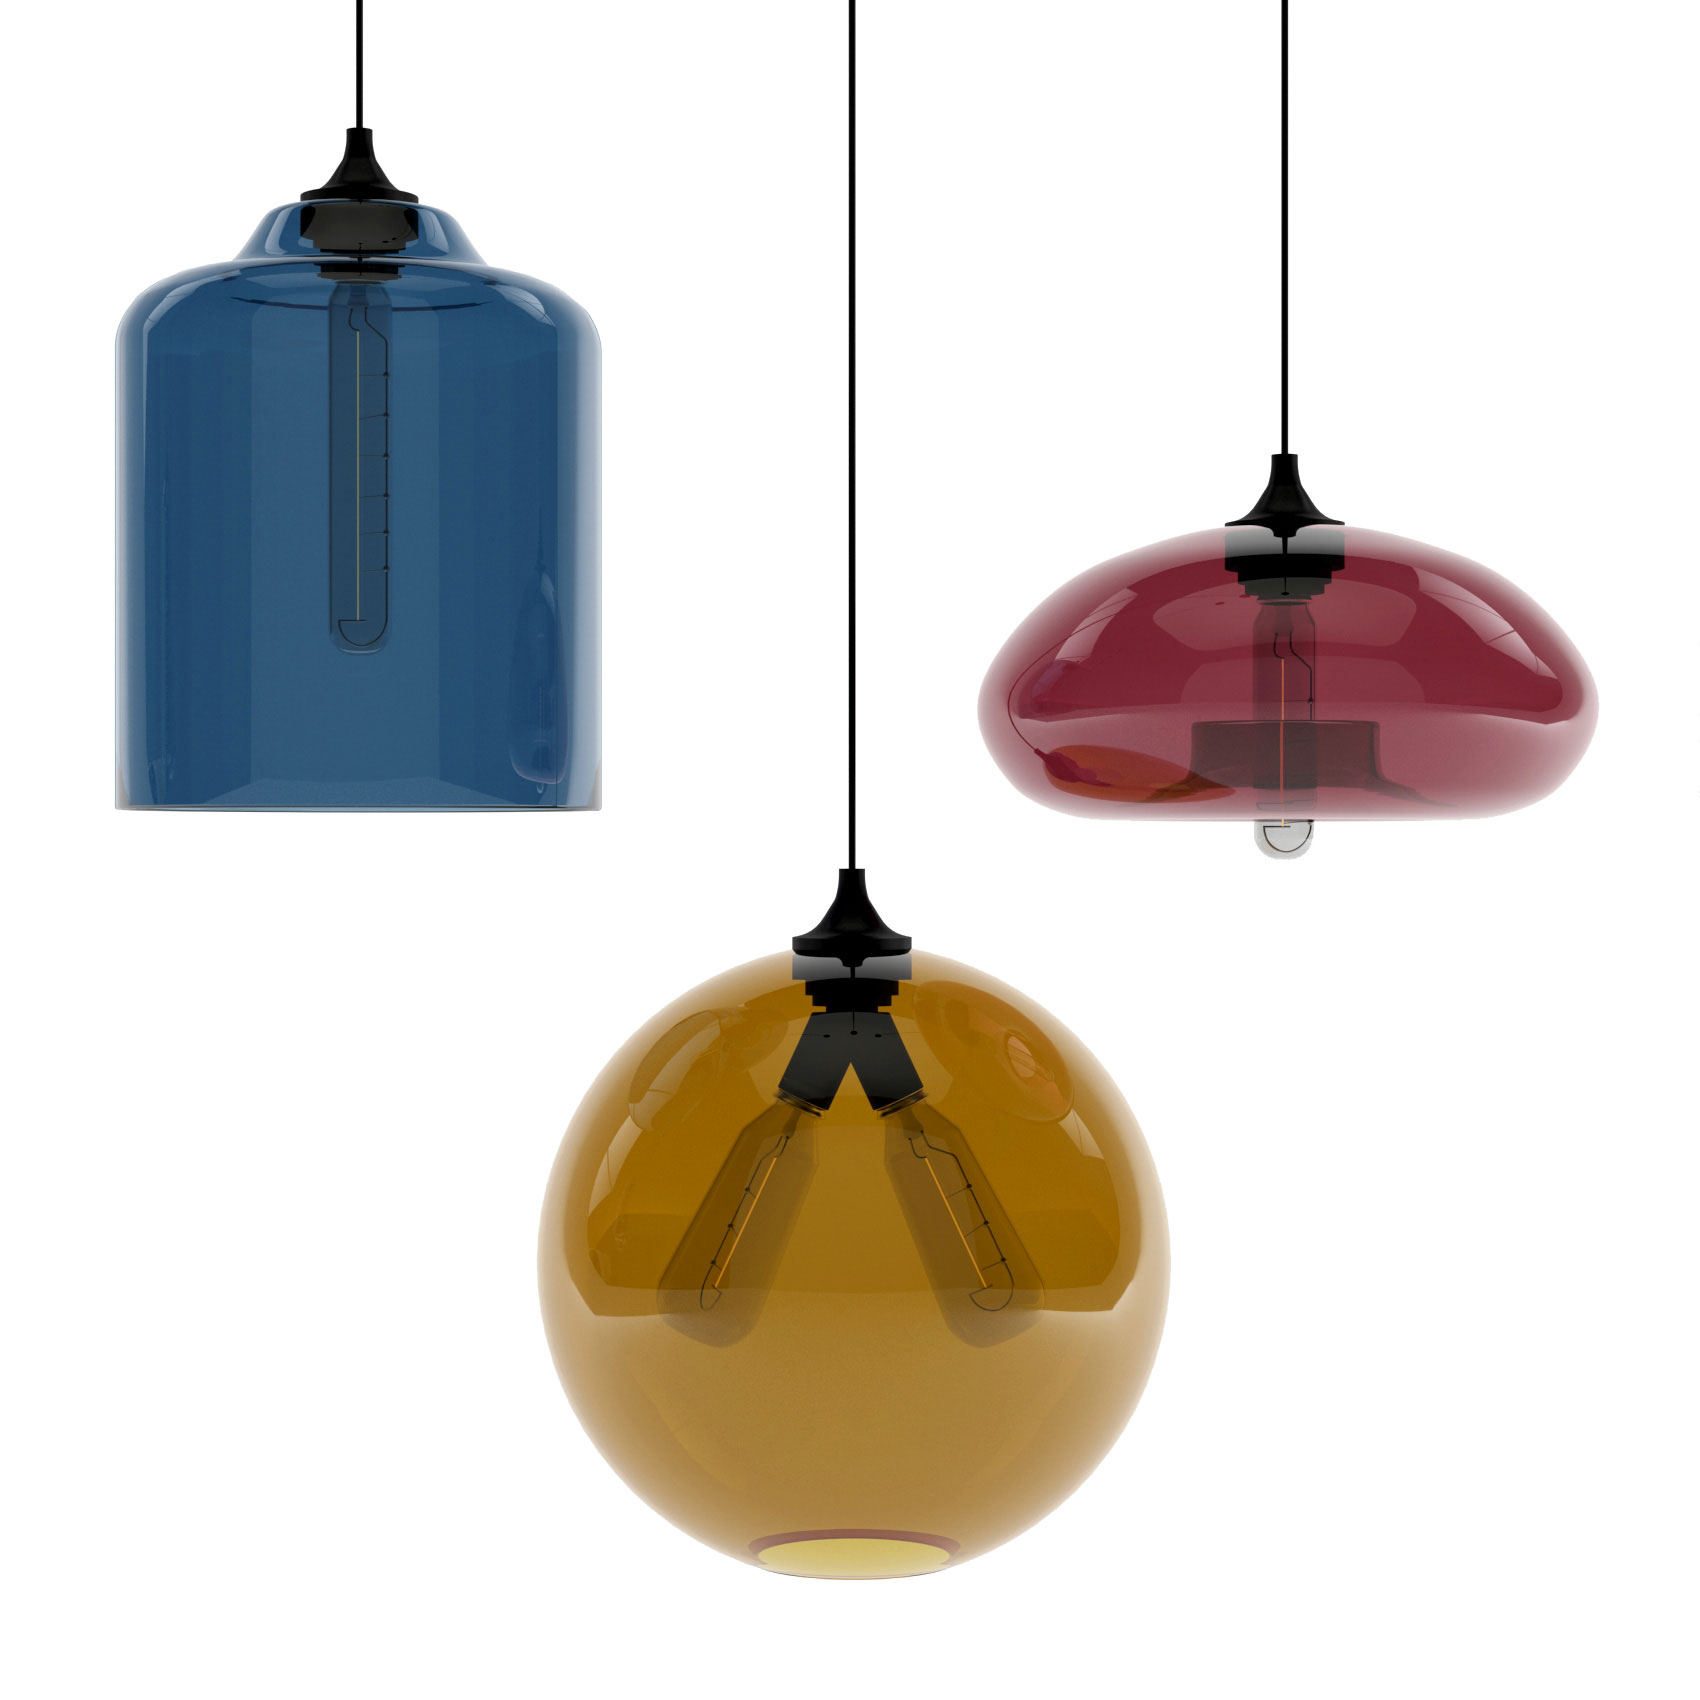 wizualizacje 3d lamp